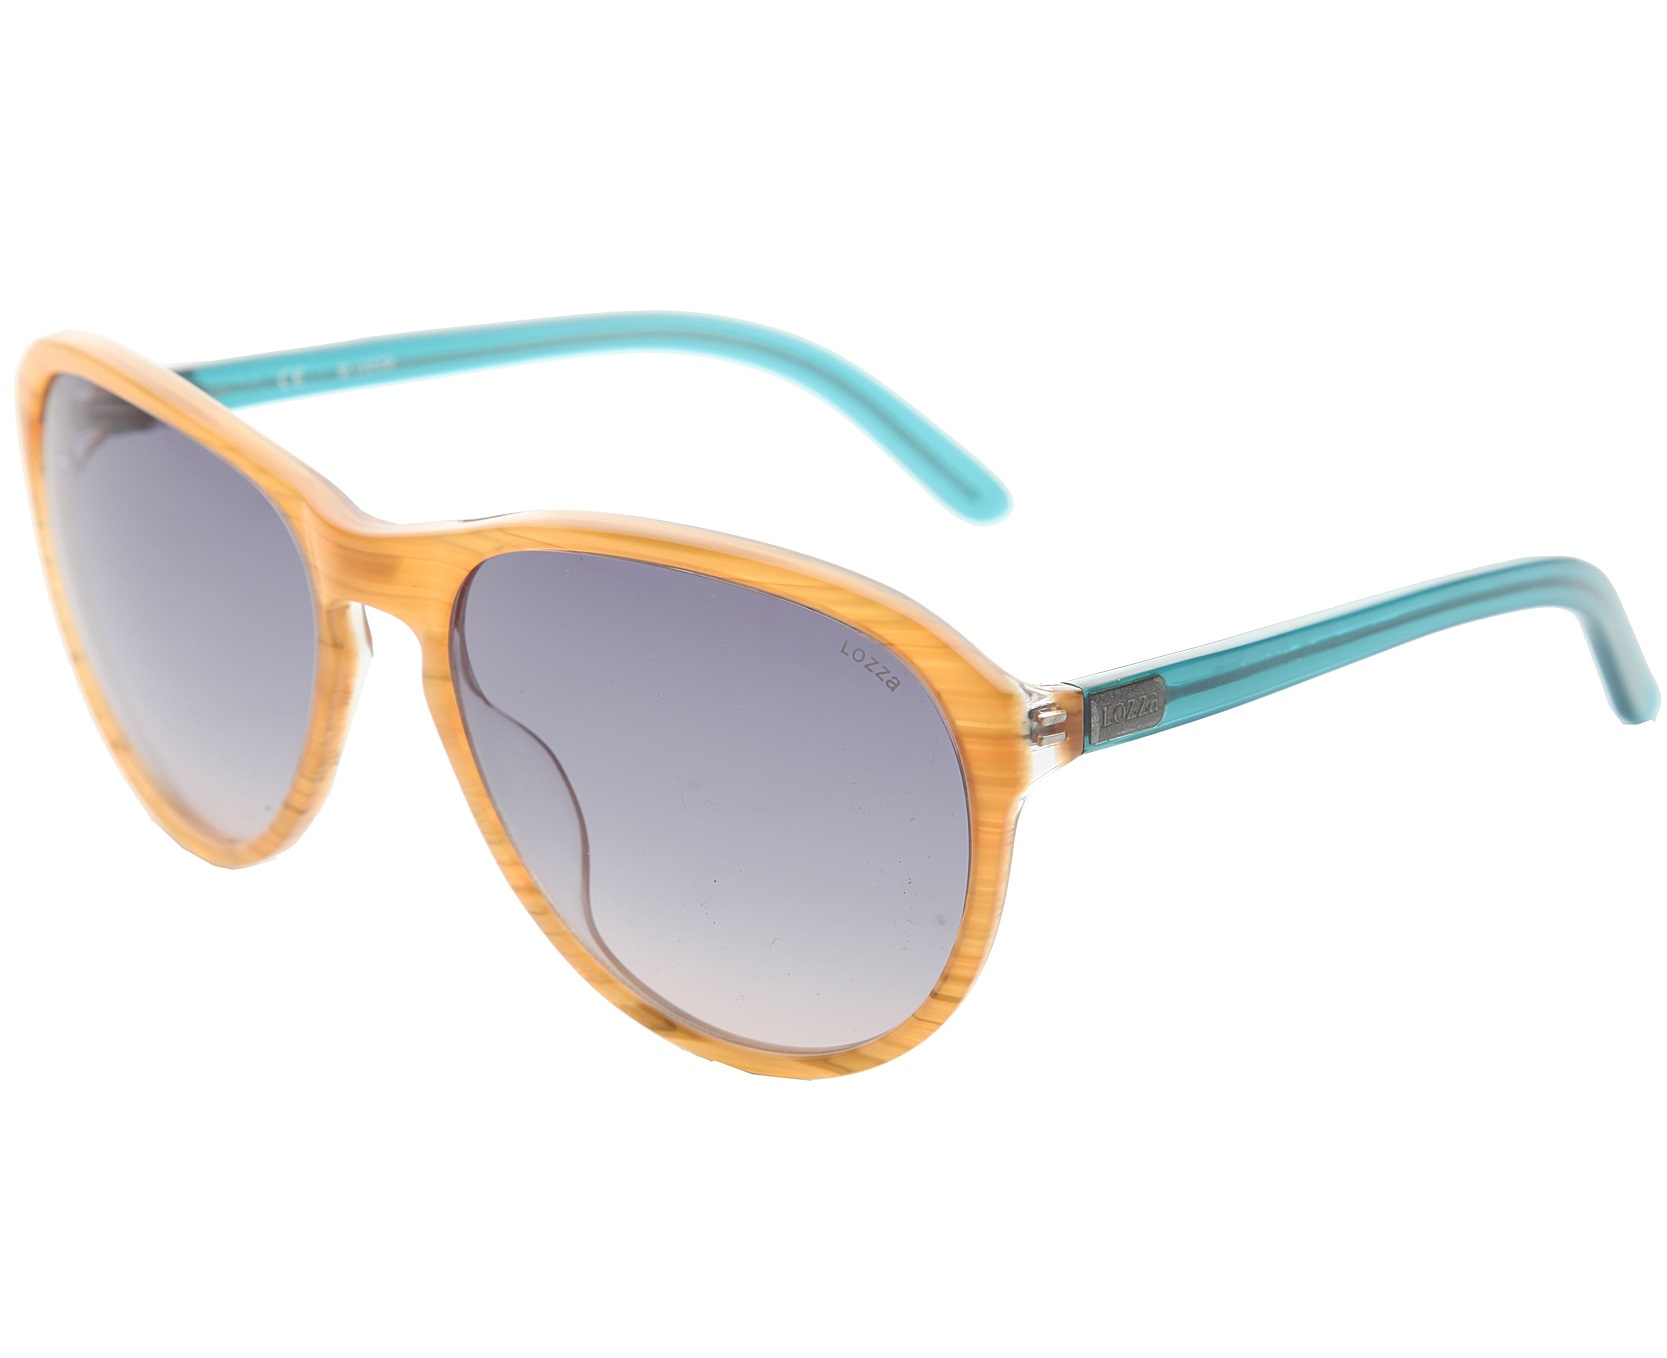 Sunglasses Lozza SL1922 5809XD Rf600302